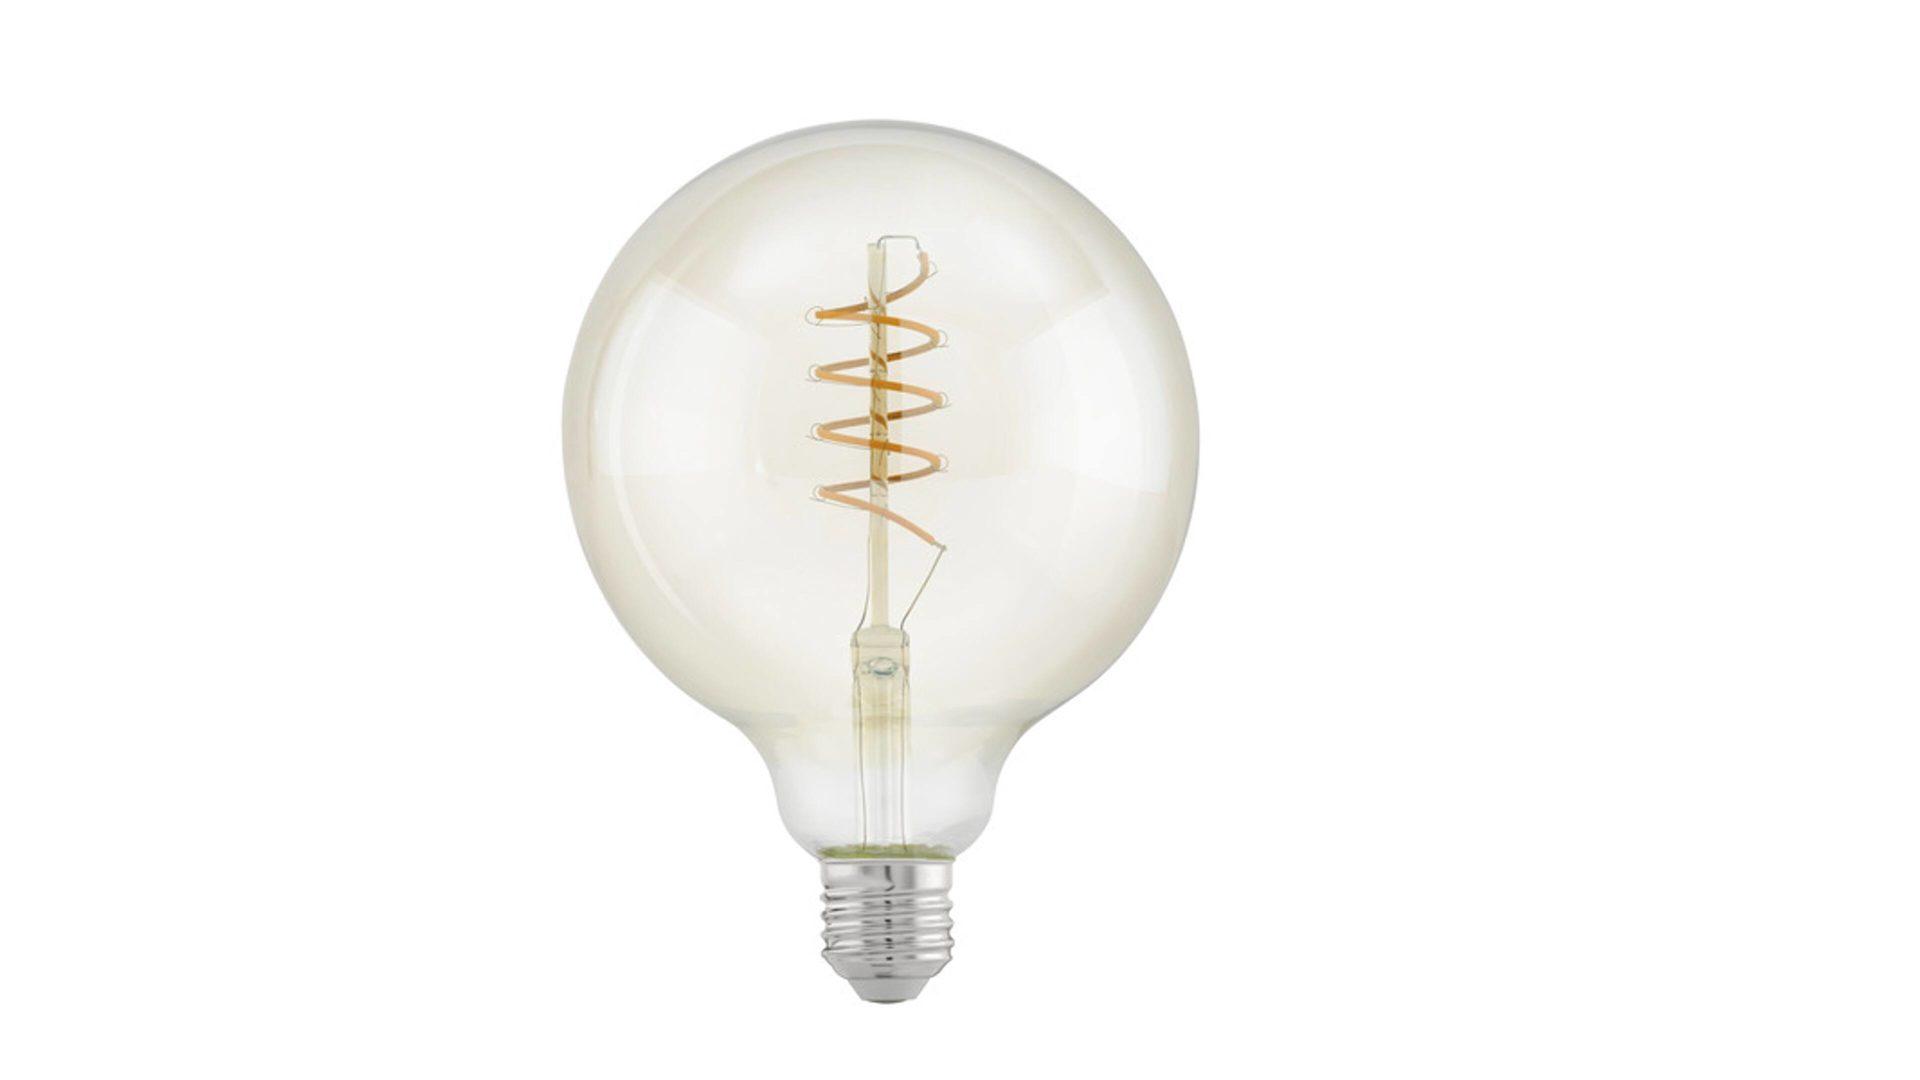 Möbel Eilers Apen, EGLO LED Leuchtmittel, LED, EGLO, EGLO